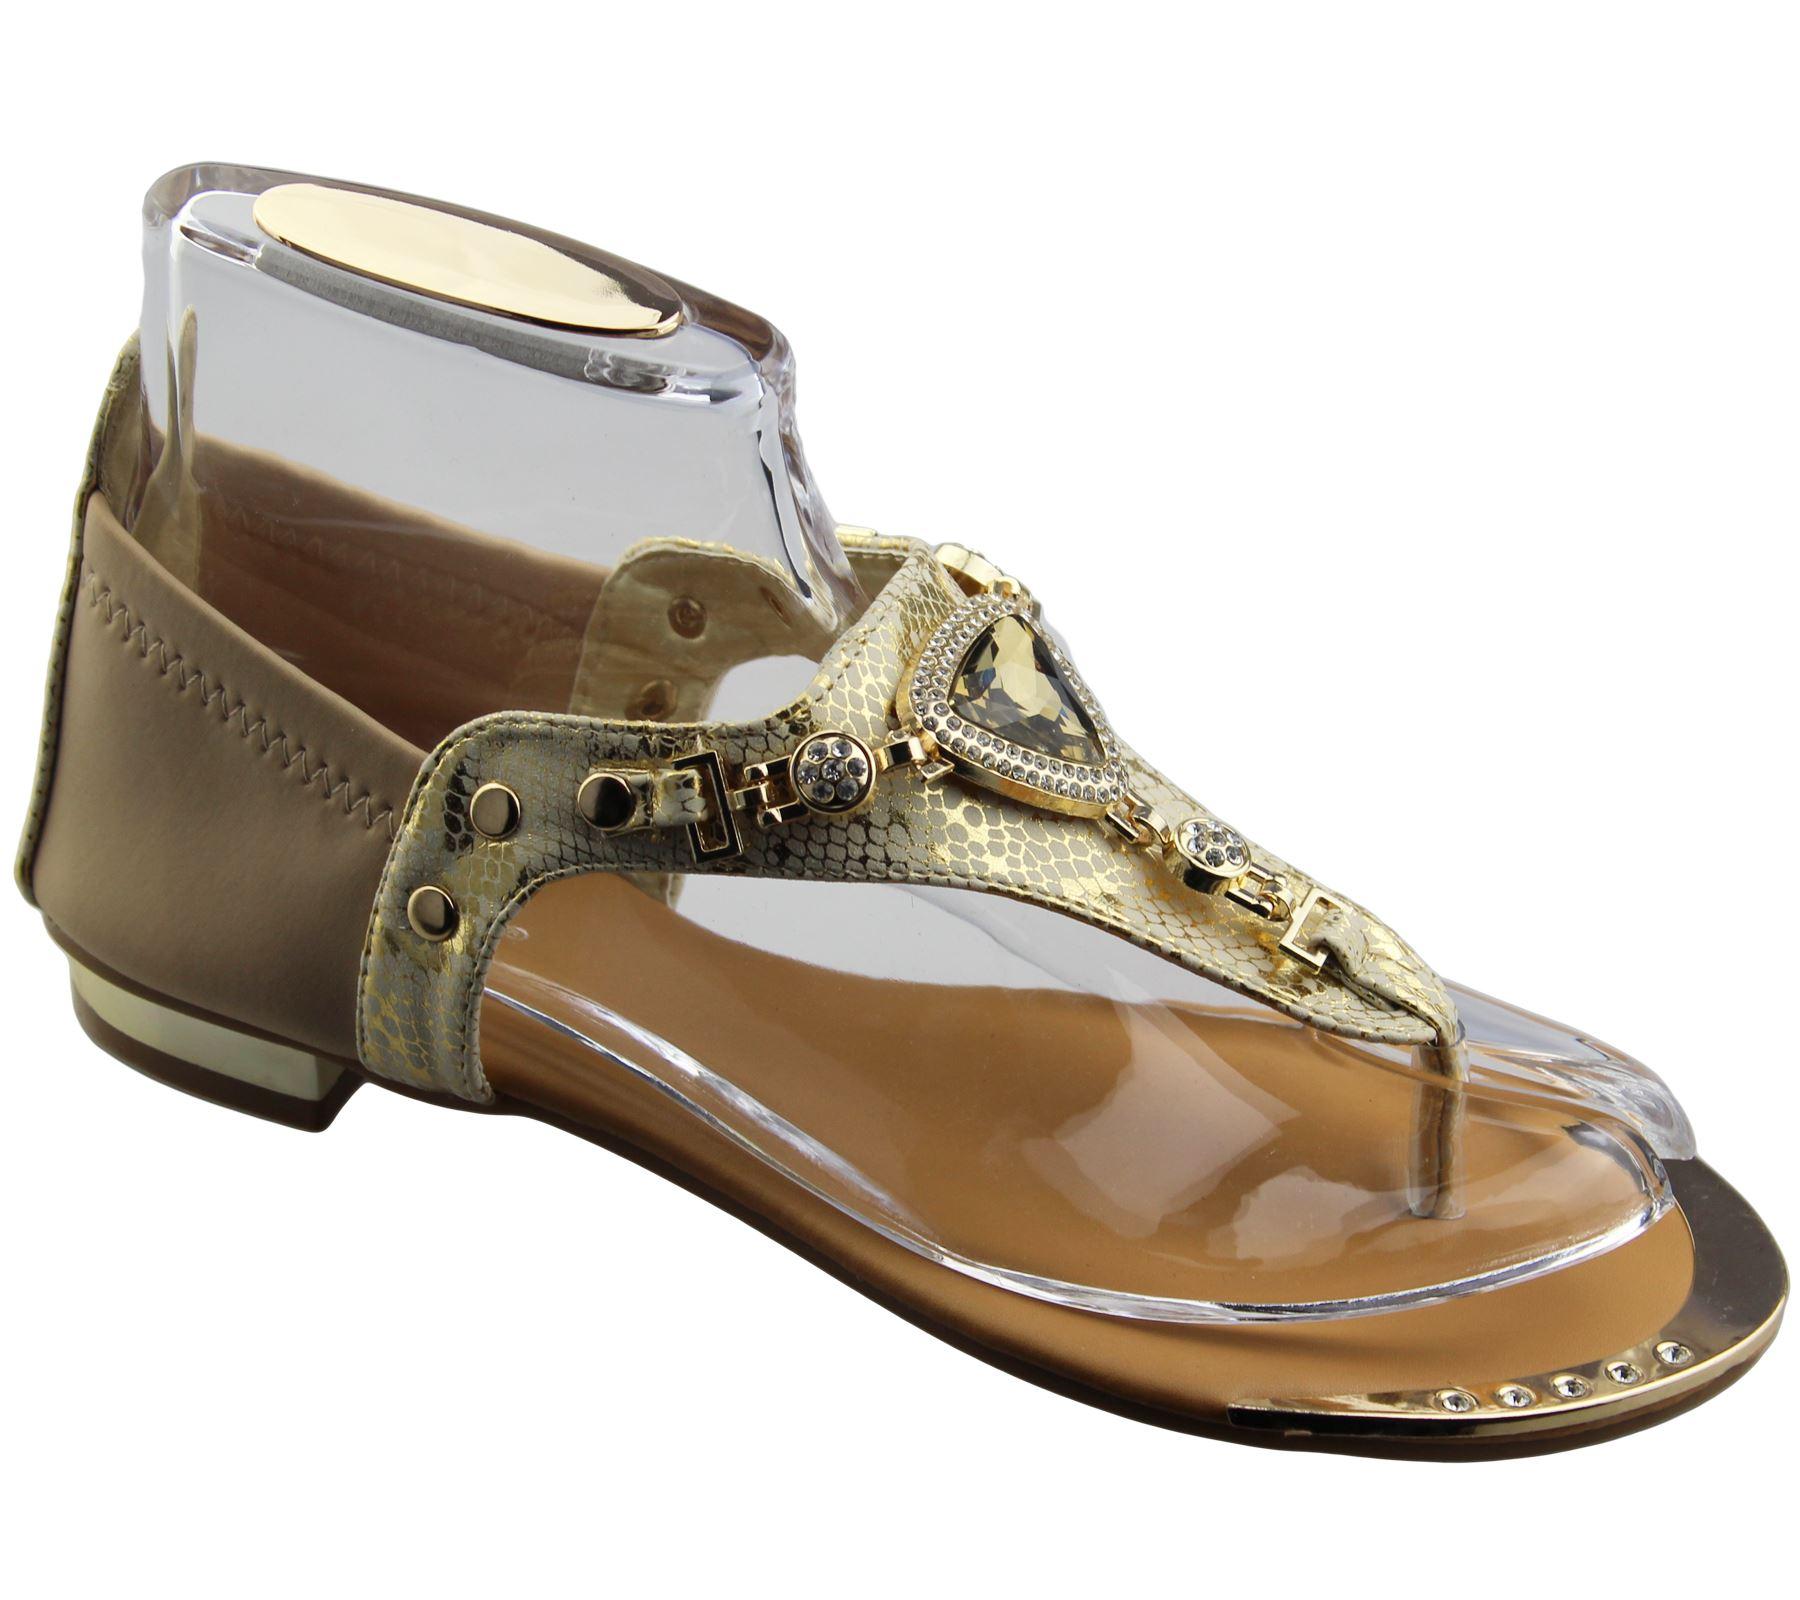 Womens-Flat-Summer-Sandals-Ladies-Diamante-Wedding-Toe-Post-Casual-Slipper thumbnail 17